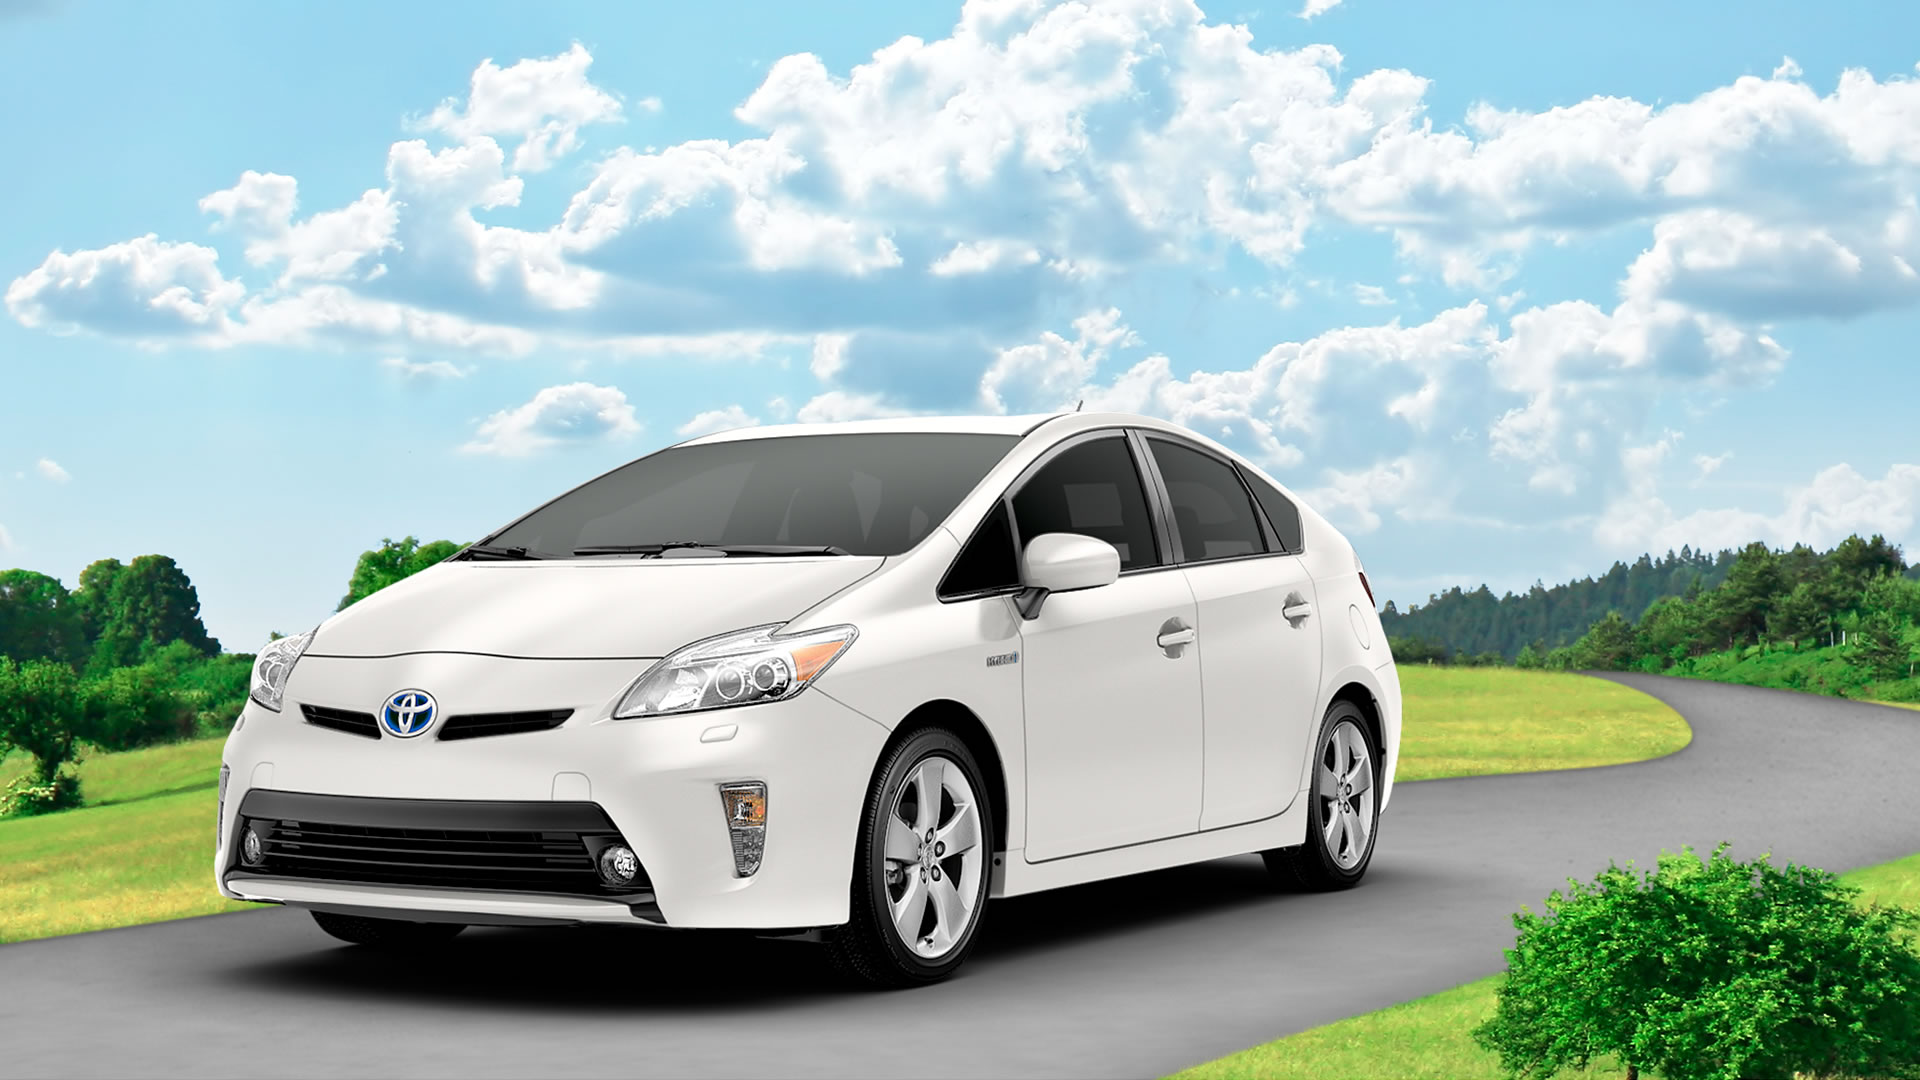 2015 Toyota Prius 11 Free Car Hd Wallpaper